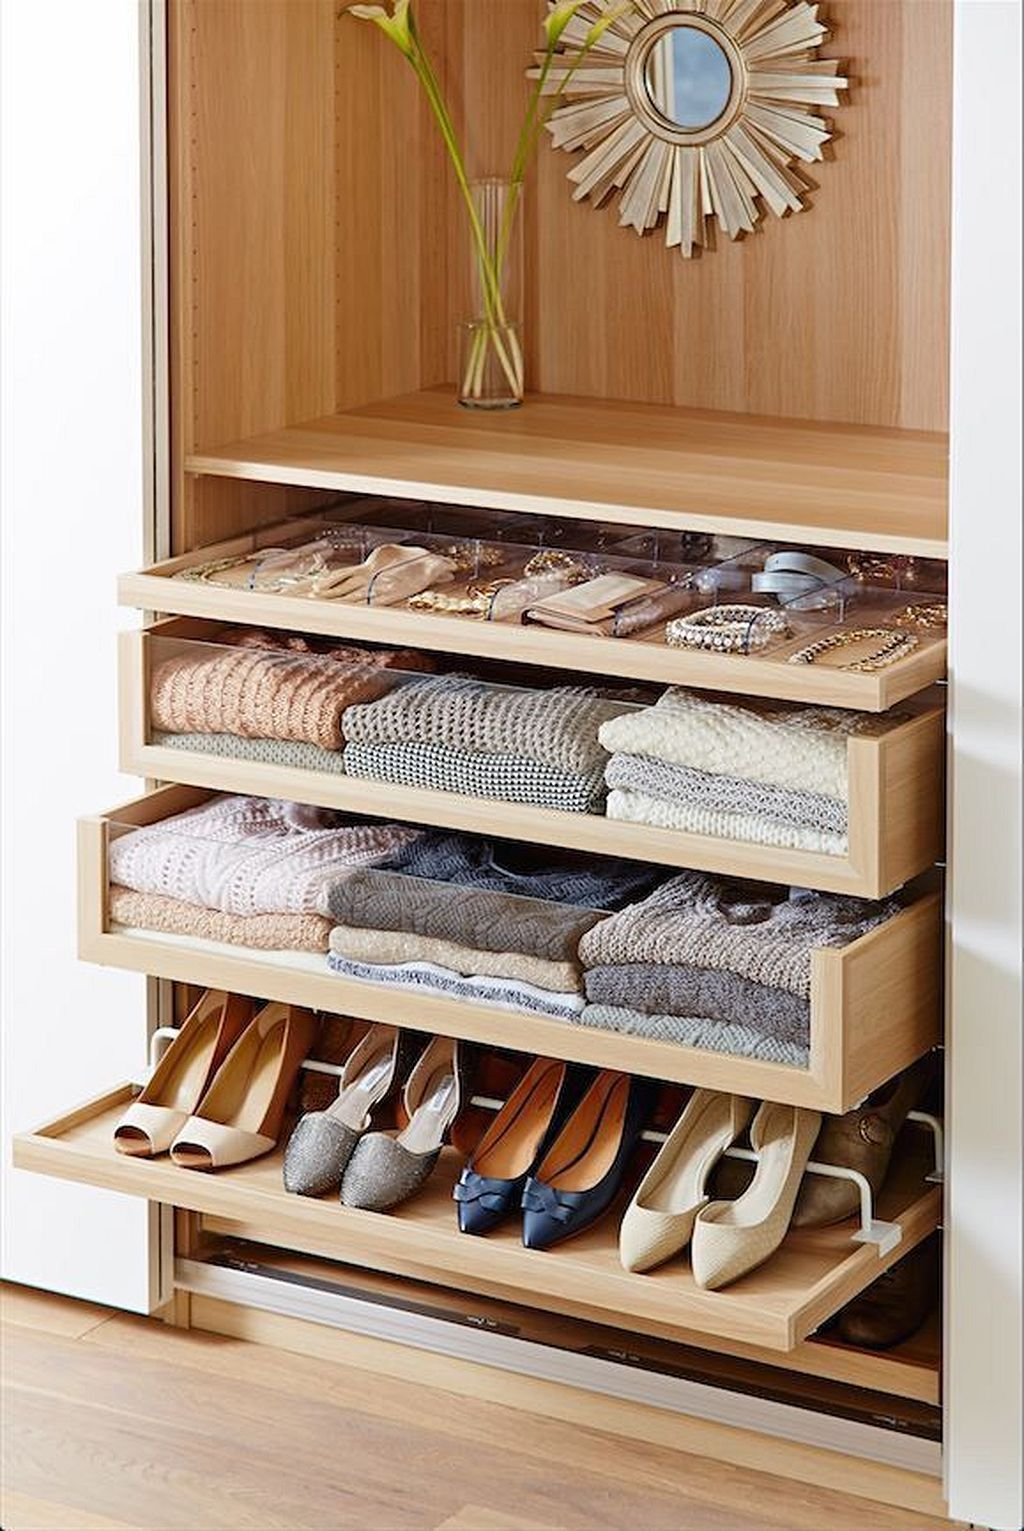 Dresser Organization Drawer Pants